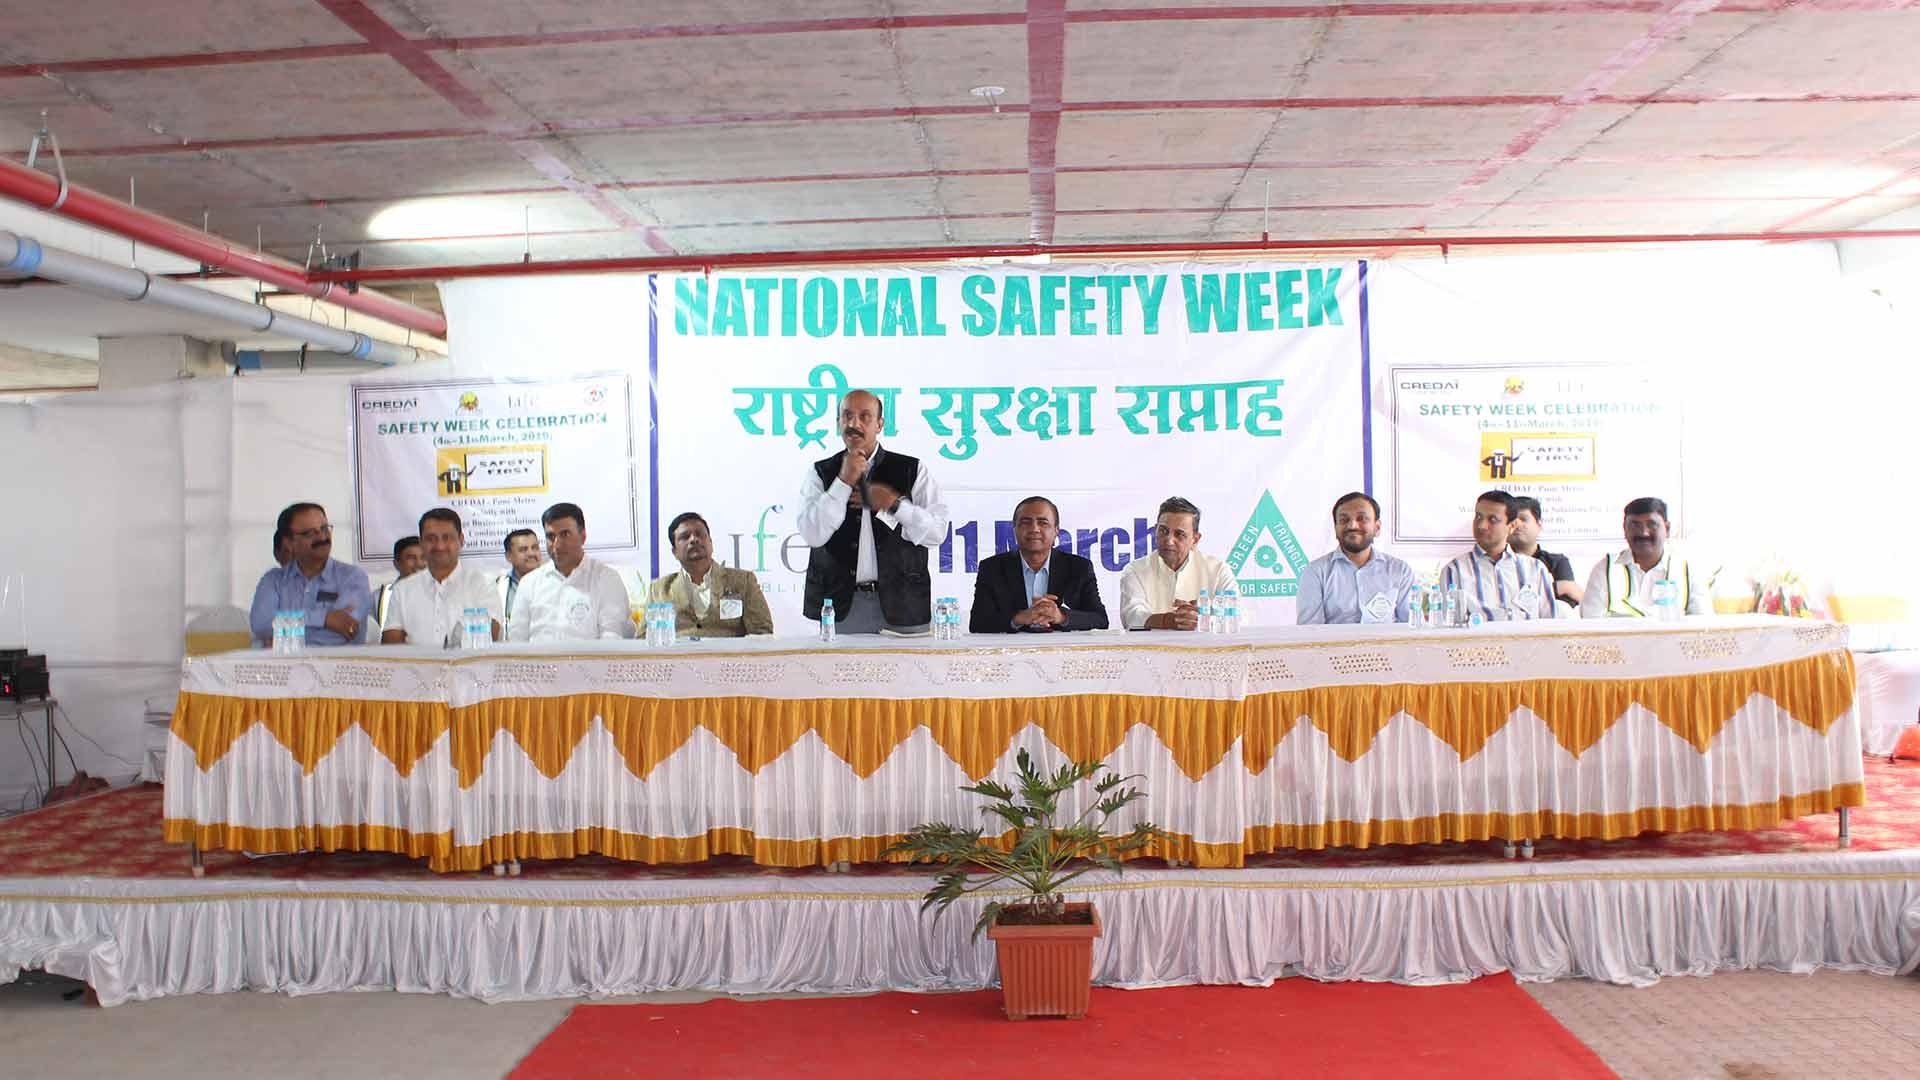 Safety Week Celebration held on Life Republic Construction Site, Hinjewadi of Kolte Patil Developers Ltd.